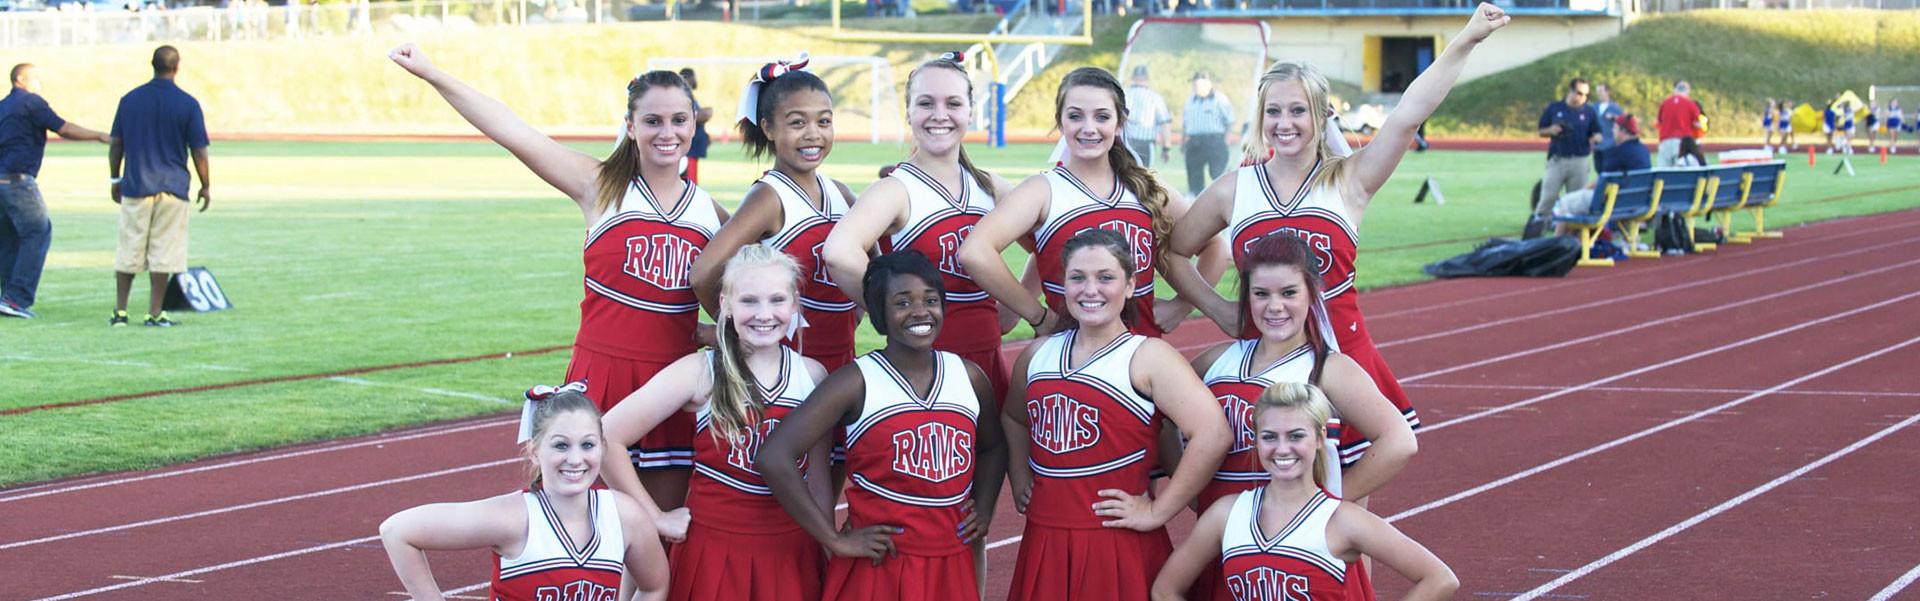 TacomaPublicSchools-US-WA-Cheerleading-Banner